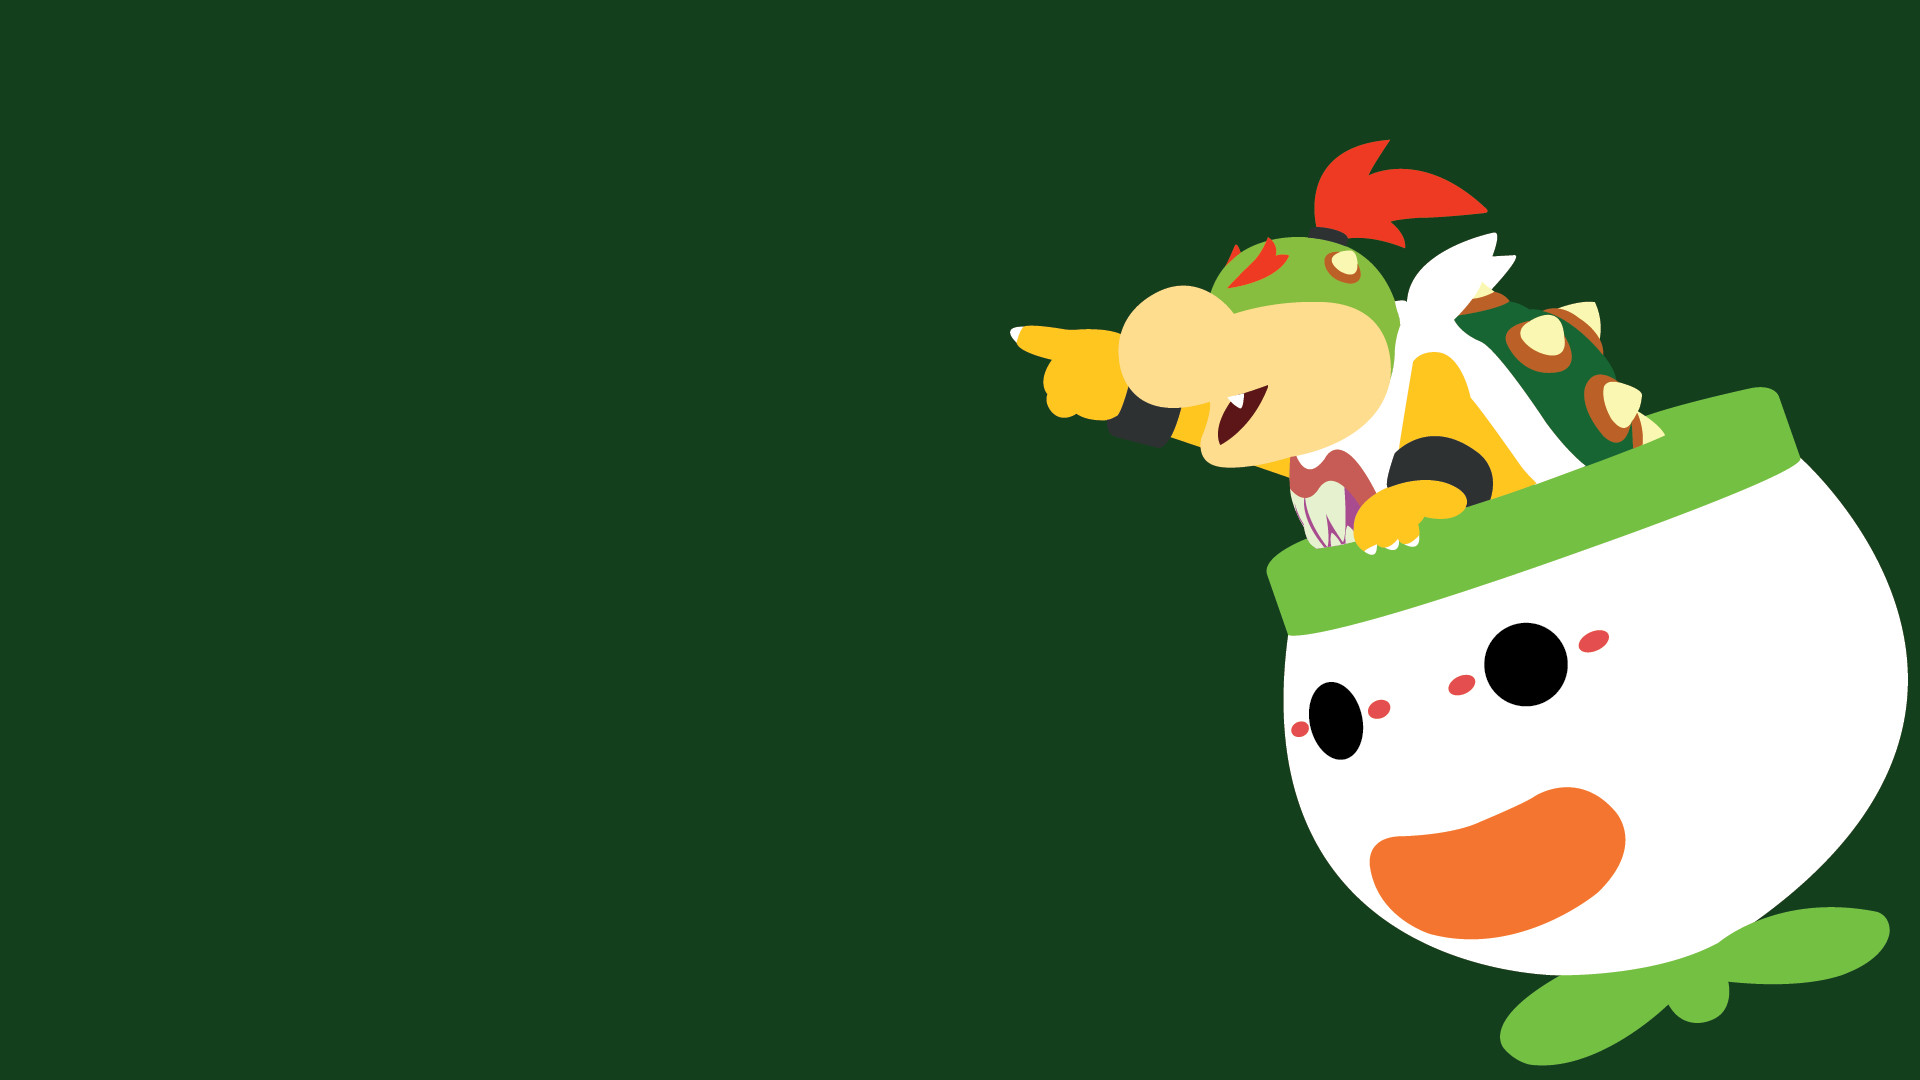 Pacman Wallpaper Iphone X Bowser Jr Wallpaper 72 Images